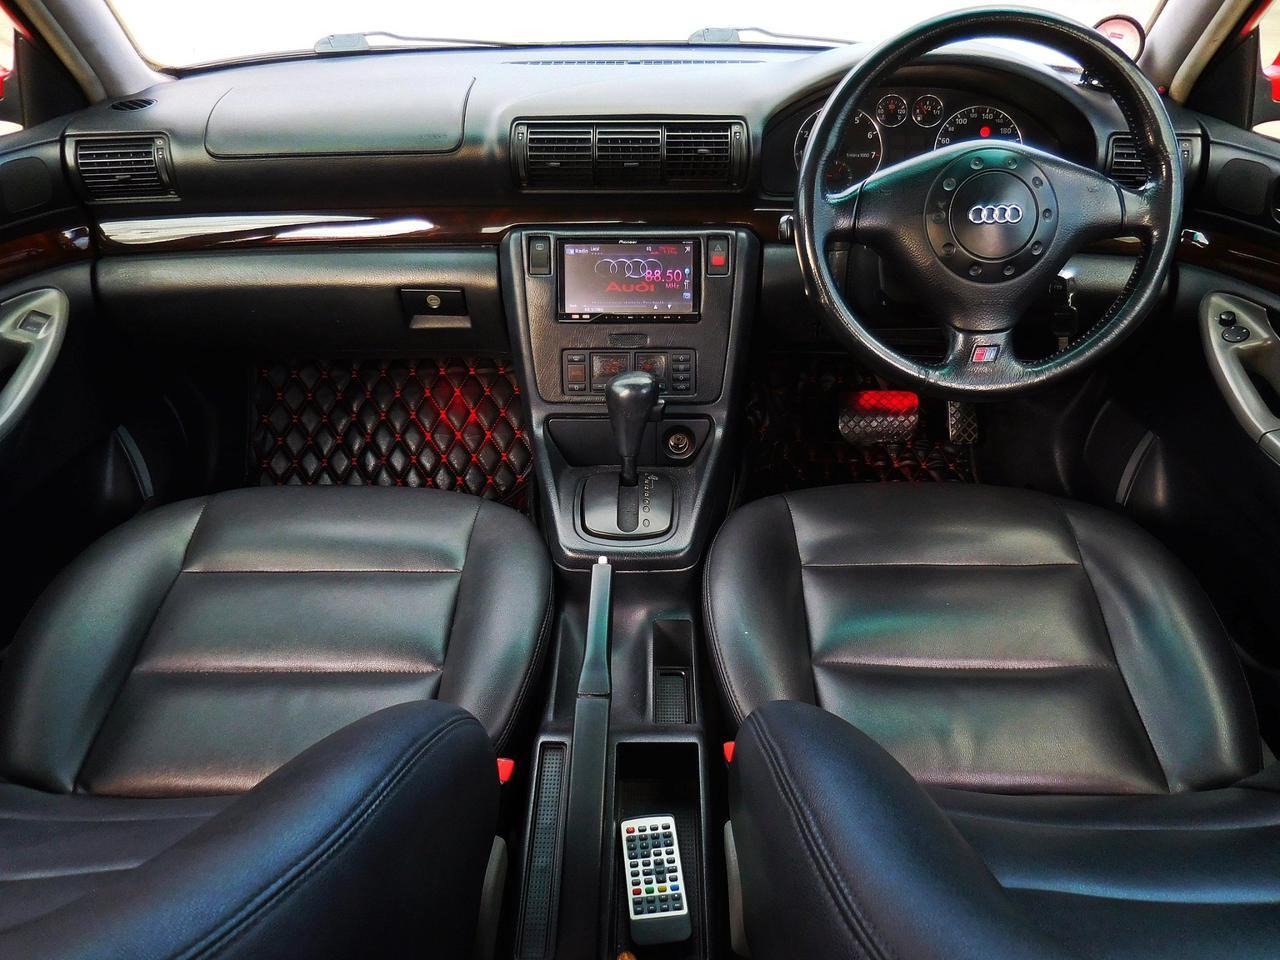 💥 AUDI ออดี้ A4 ปี 1997 เกียร์ออโต้ ไม่เคยชน สมถนะเยี่ยม ของ แต่ง เพียบ รถเก๋ง มือสอง ราคาถูก พร้อมใช้งาน รูปที่ 4